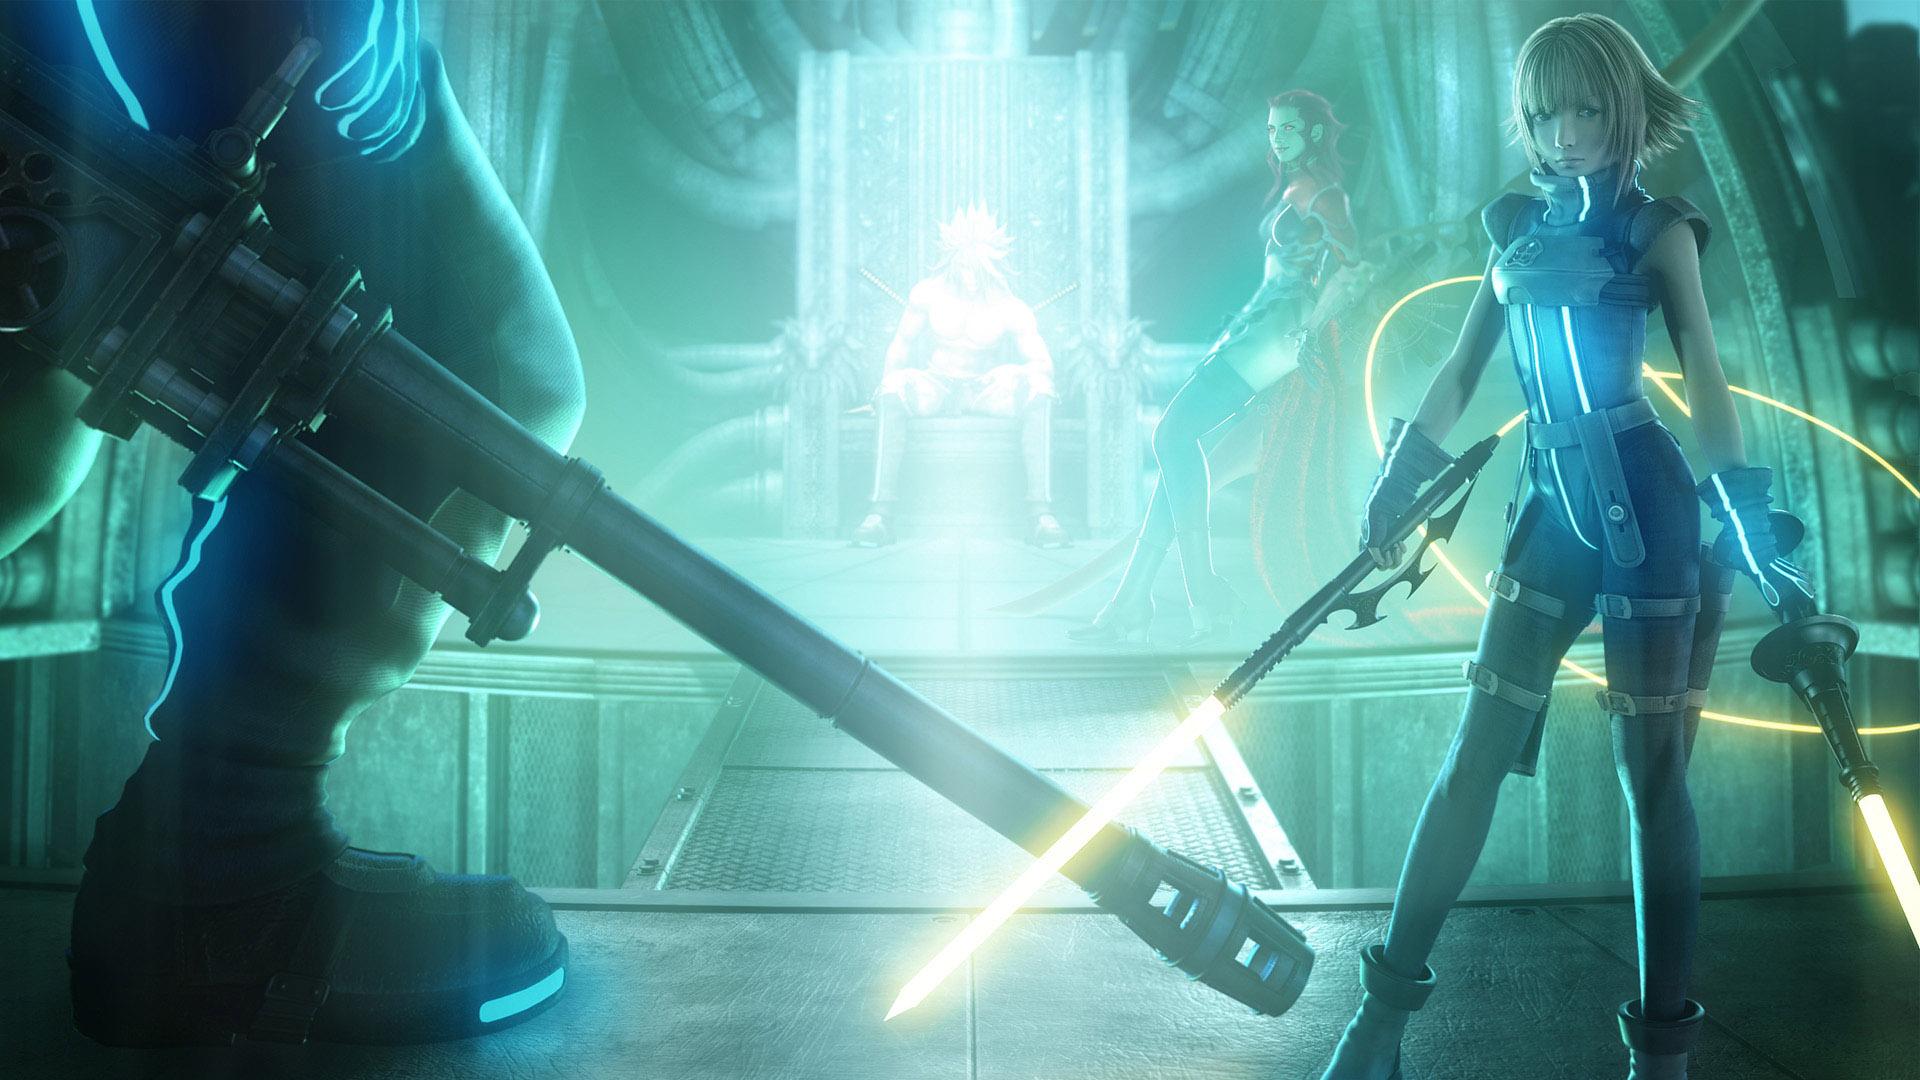 Final Fantasy Vii Wallpaper Page 5 Zerochan Anime Image Board